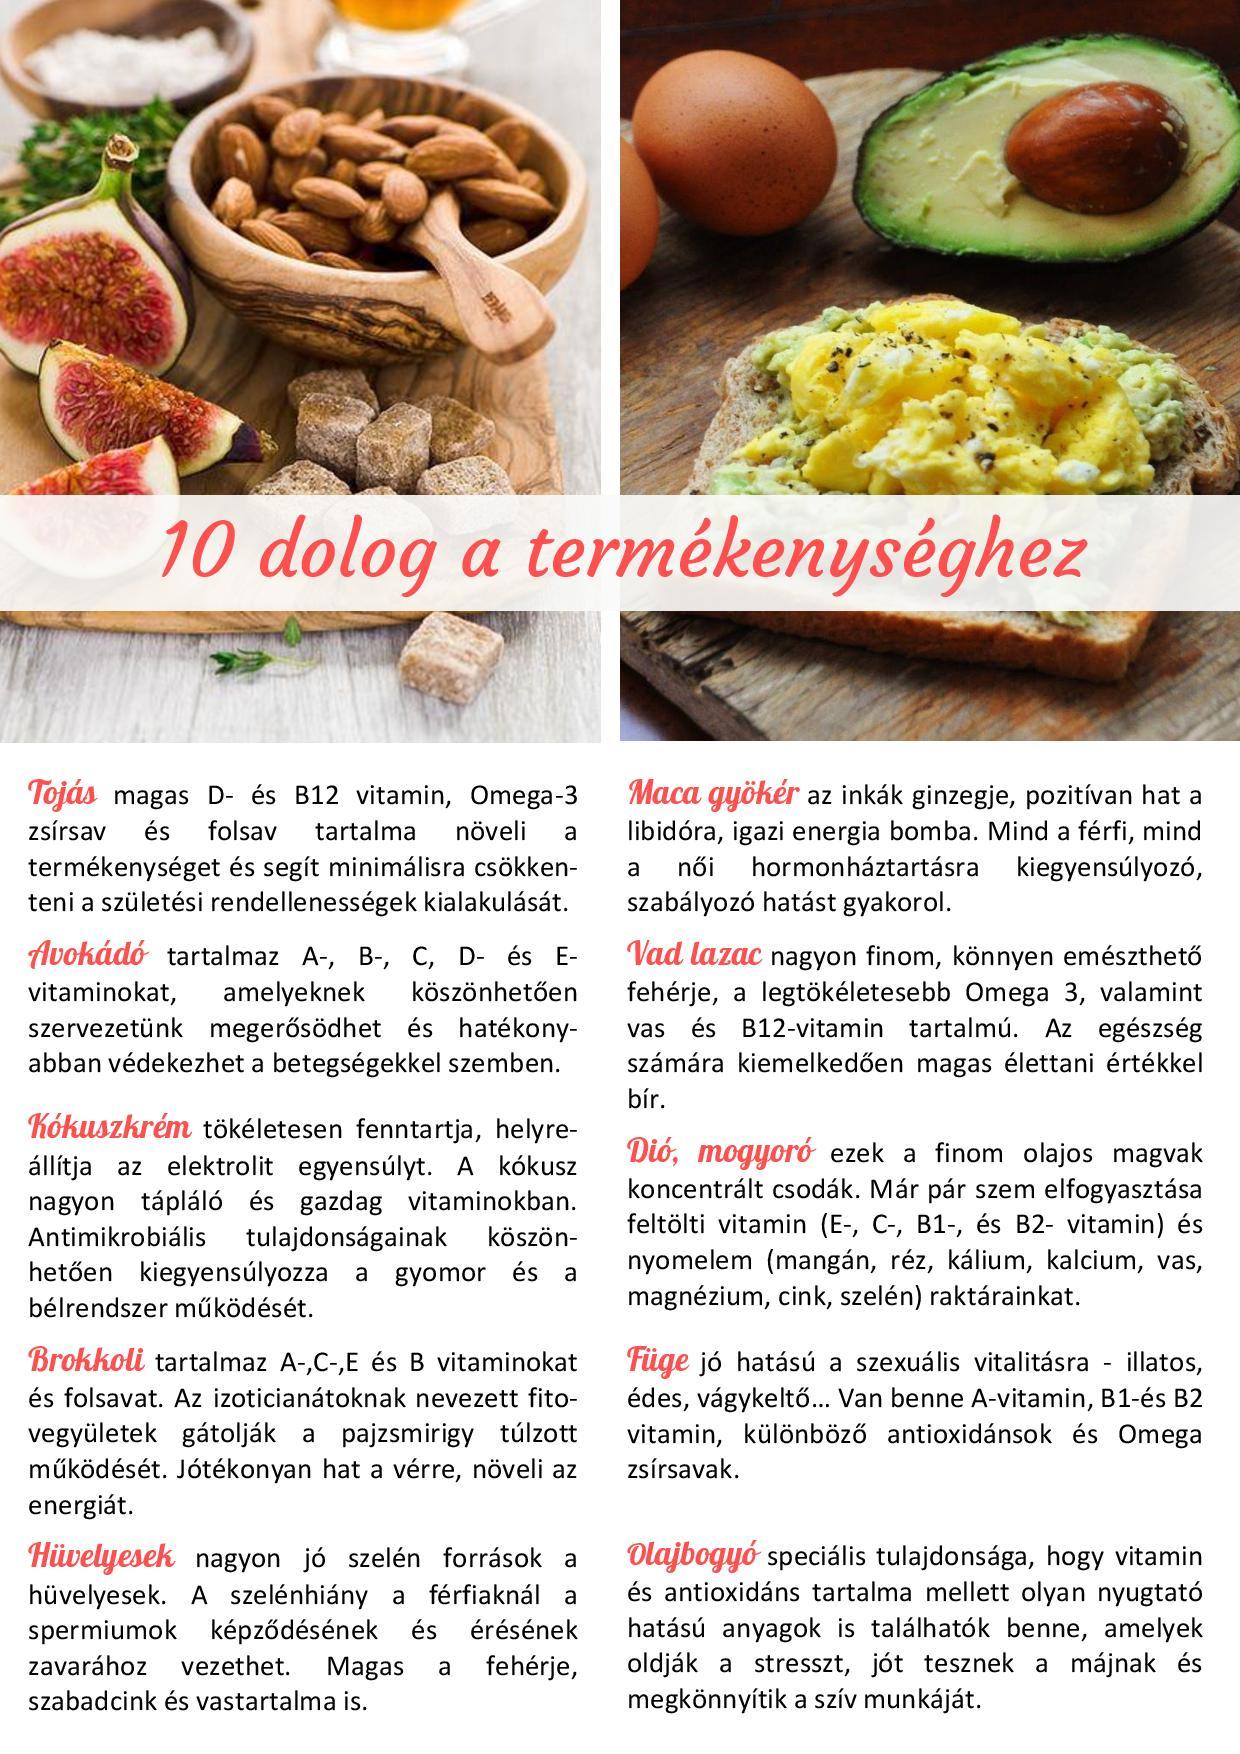 10_dolog_a_termekenyseghez03.jpg